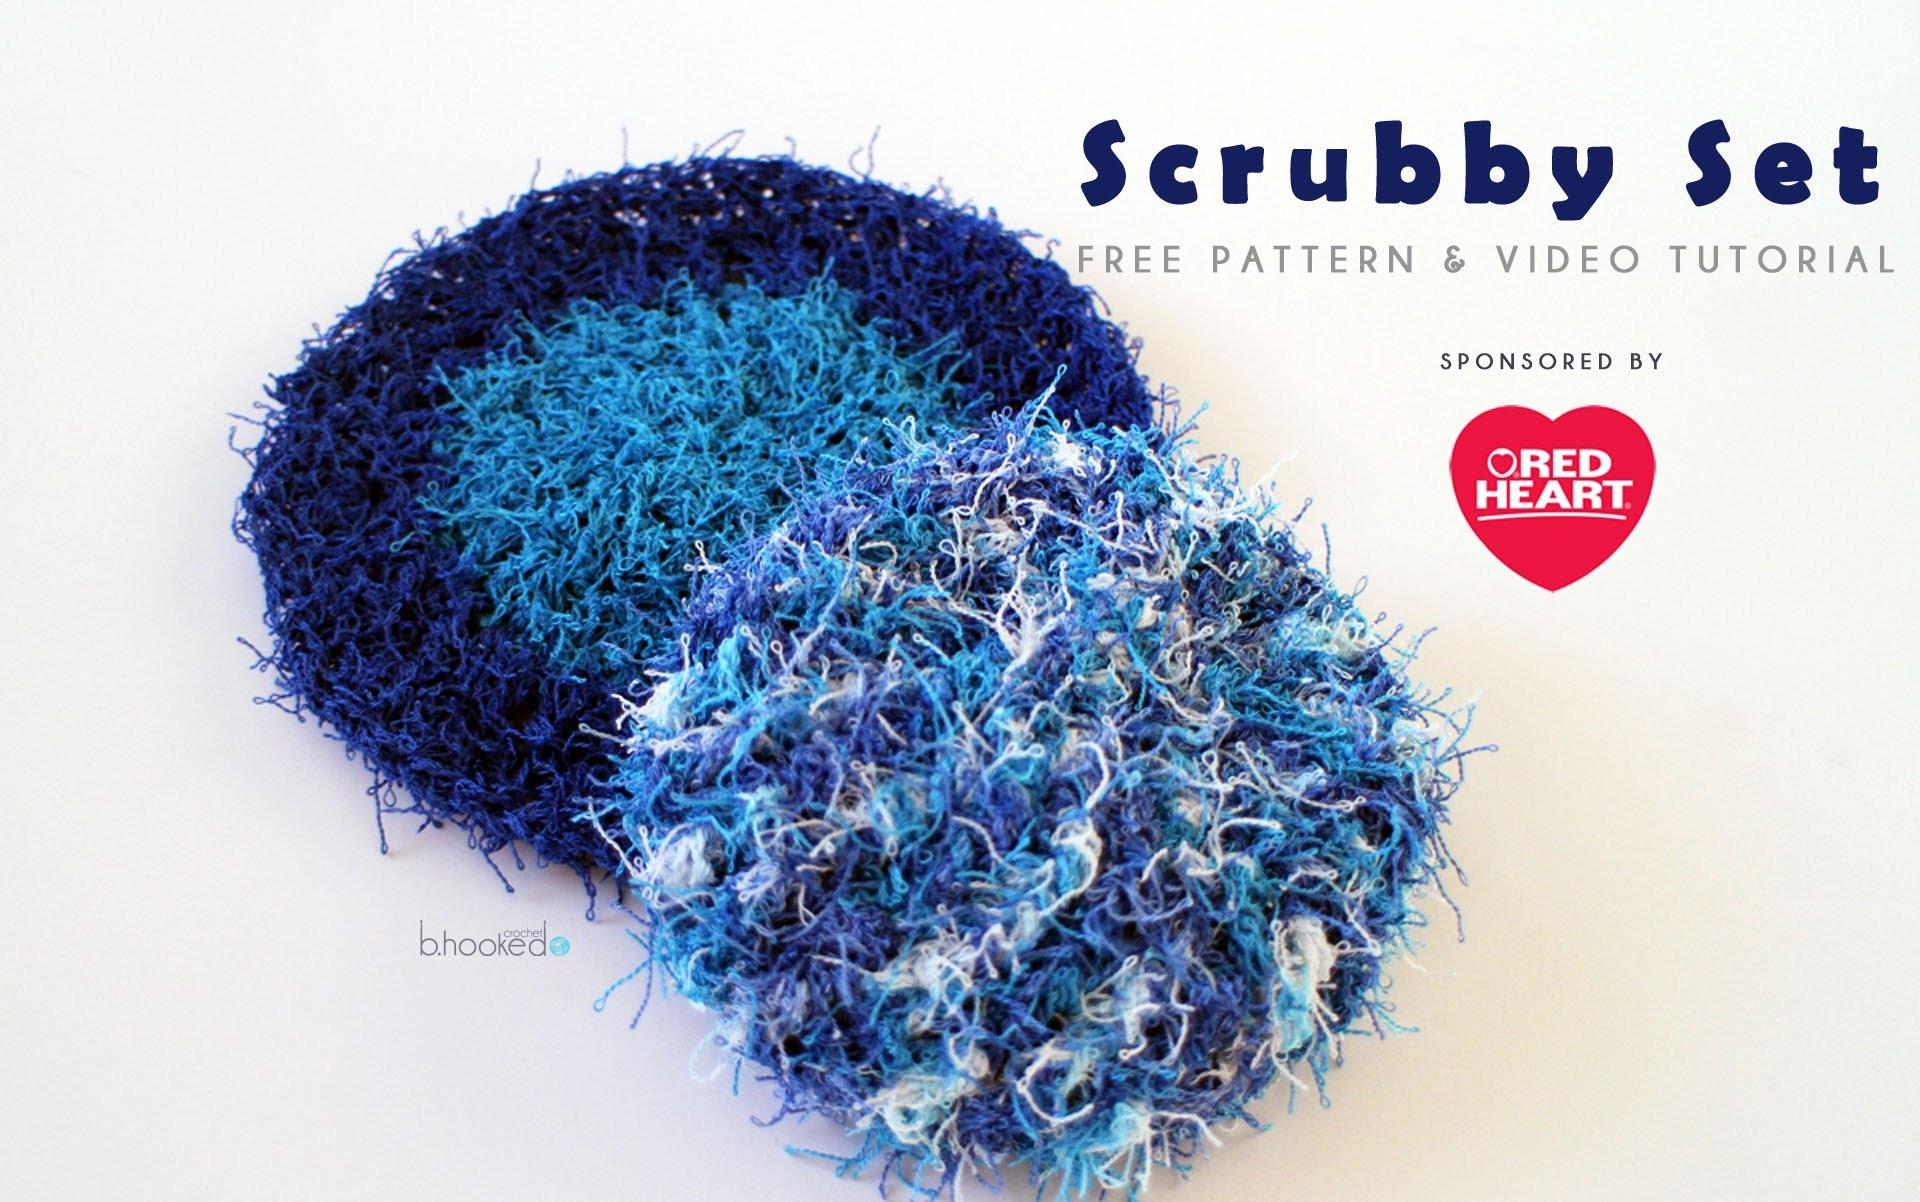 Crochet Scrubby Set Left Handed Red Heart Scrubby